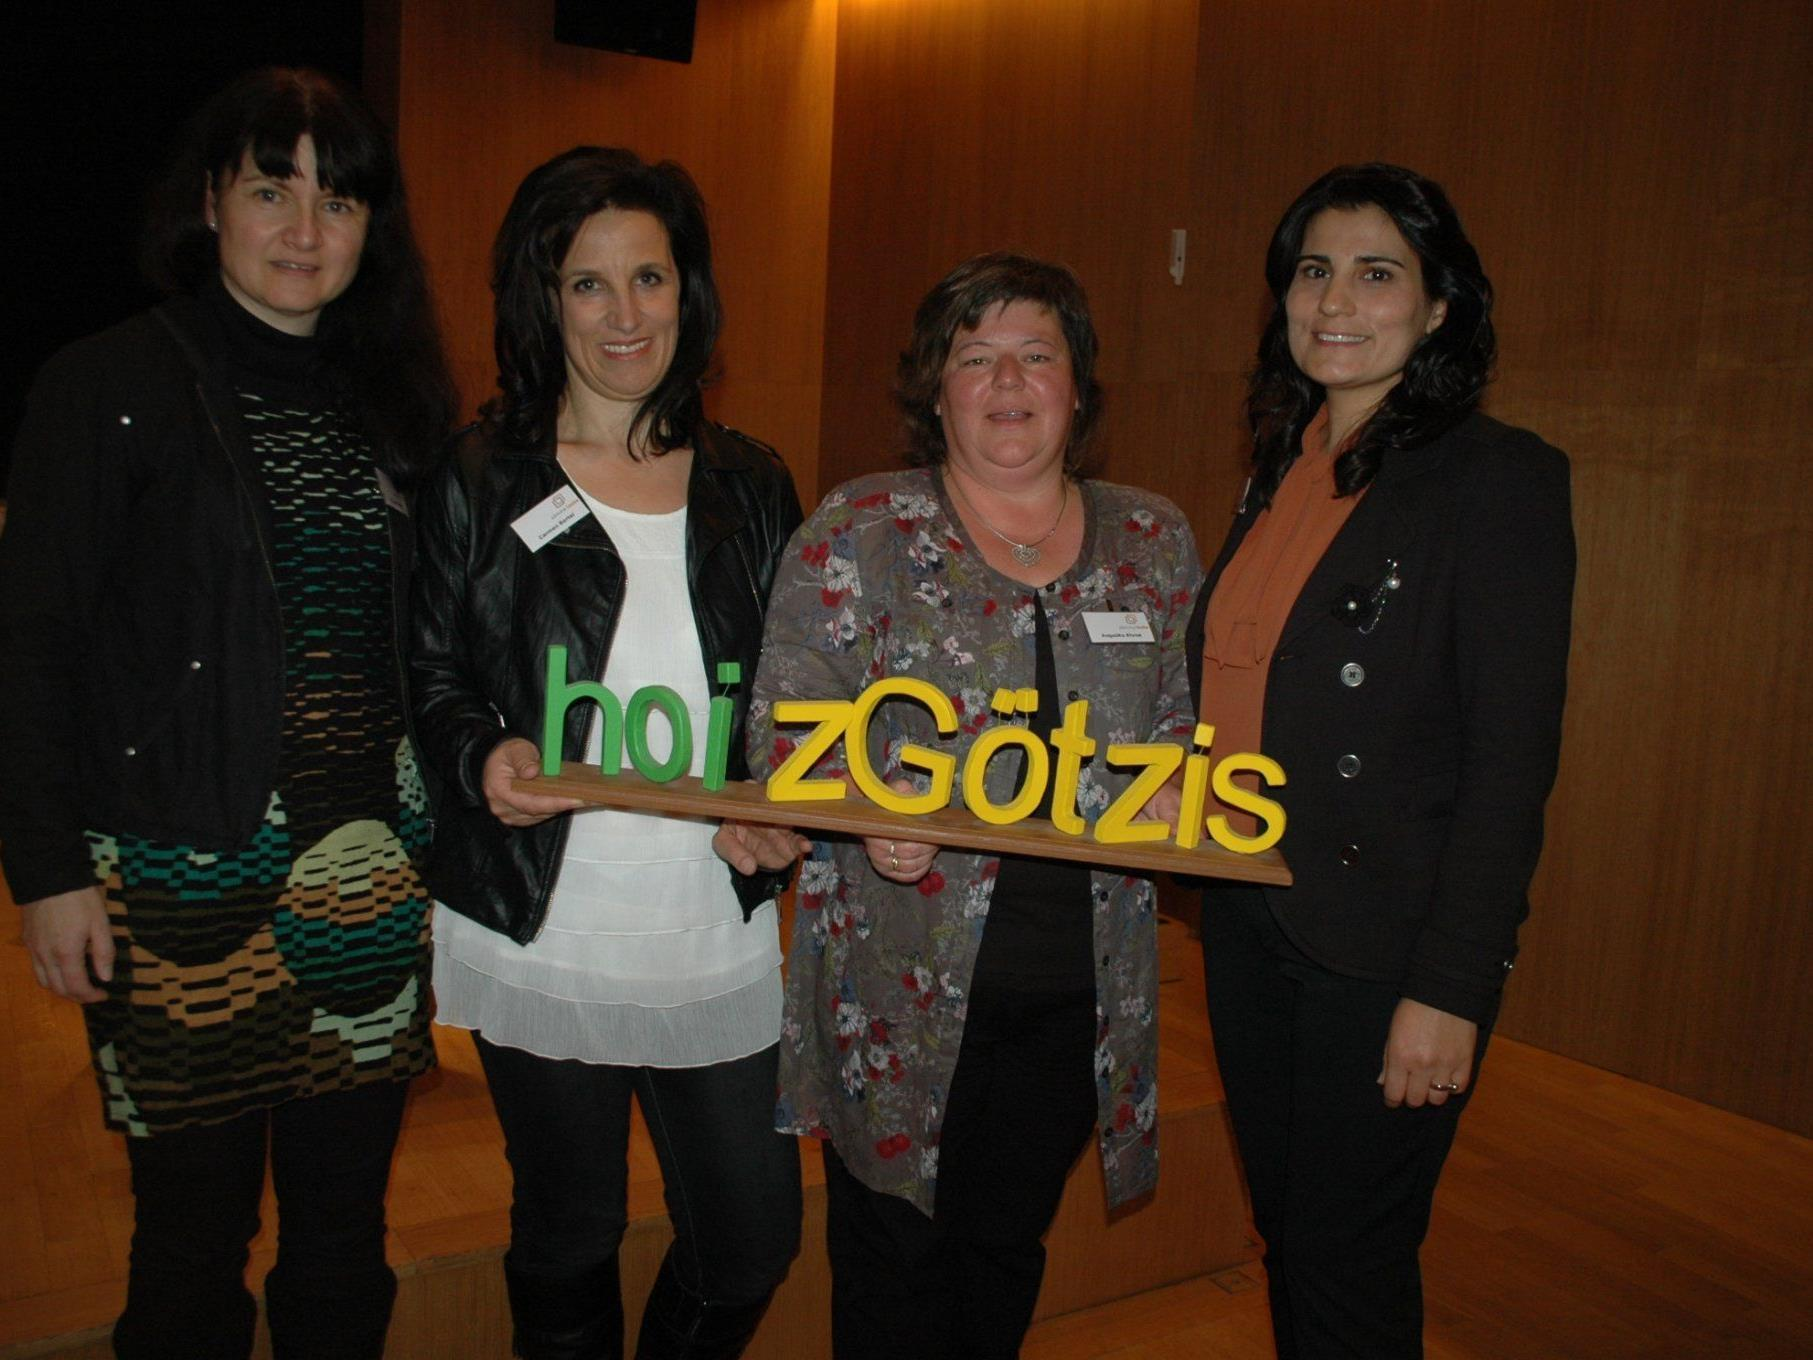 Das engagierte Organisationsteam (v.l.) Helga Repnik, Carmen Bertel, Angelika Ehrne & Bican Cosgun